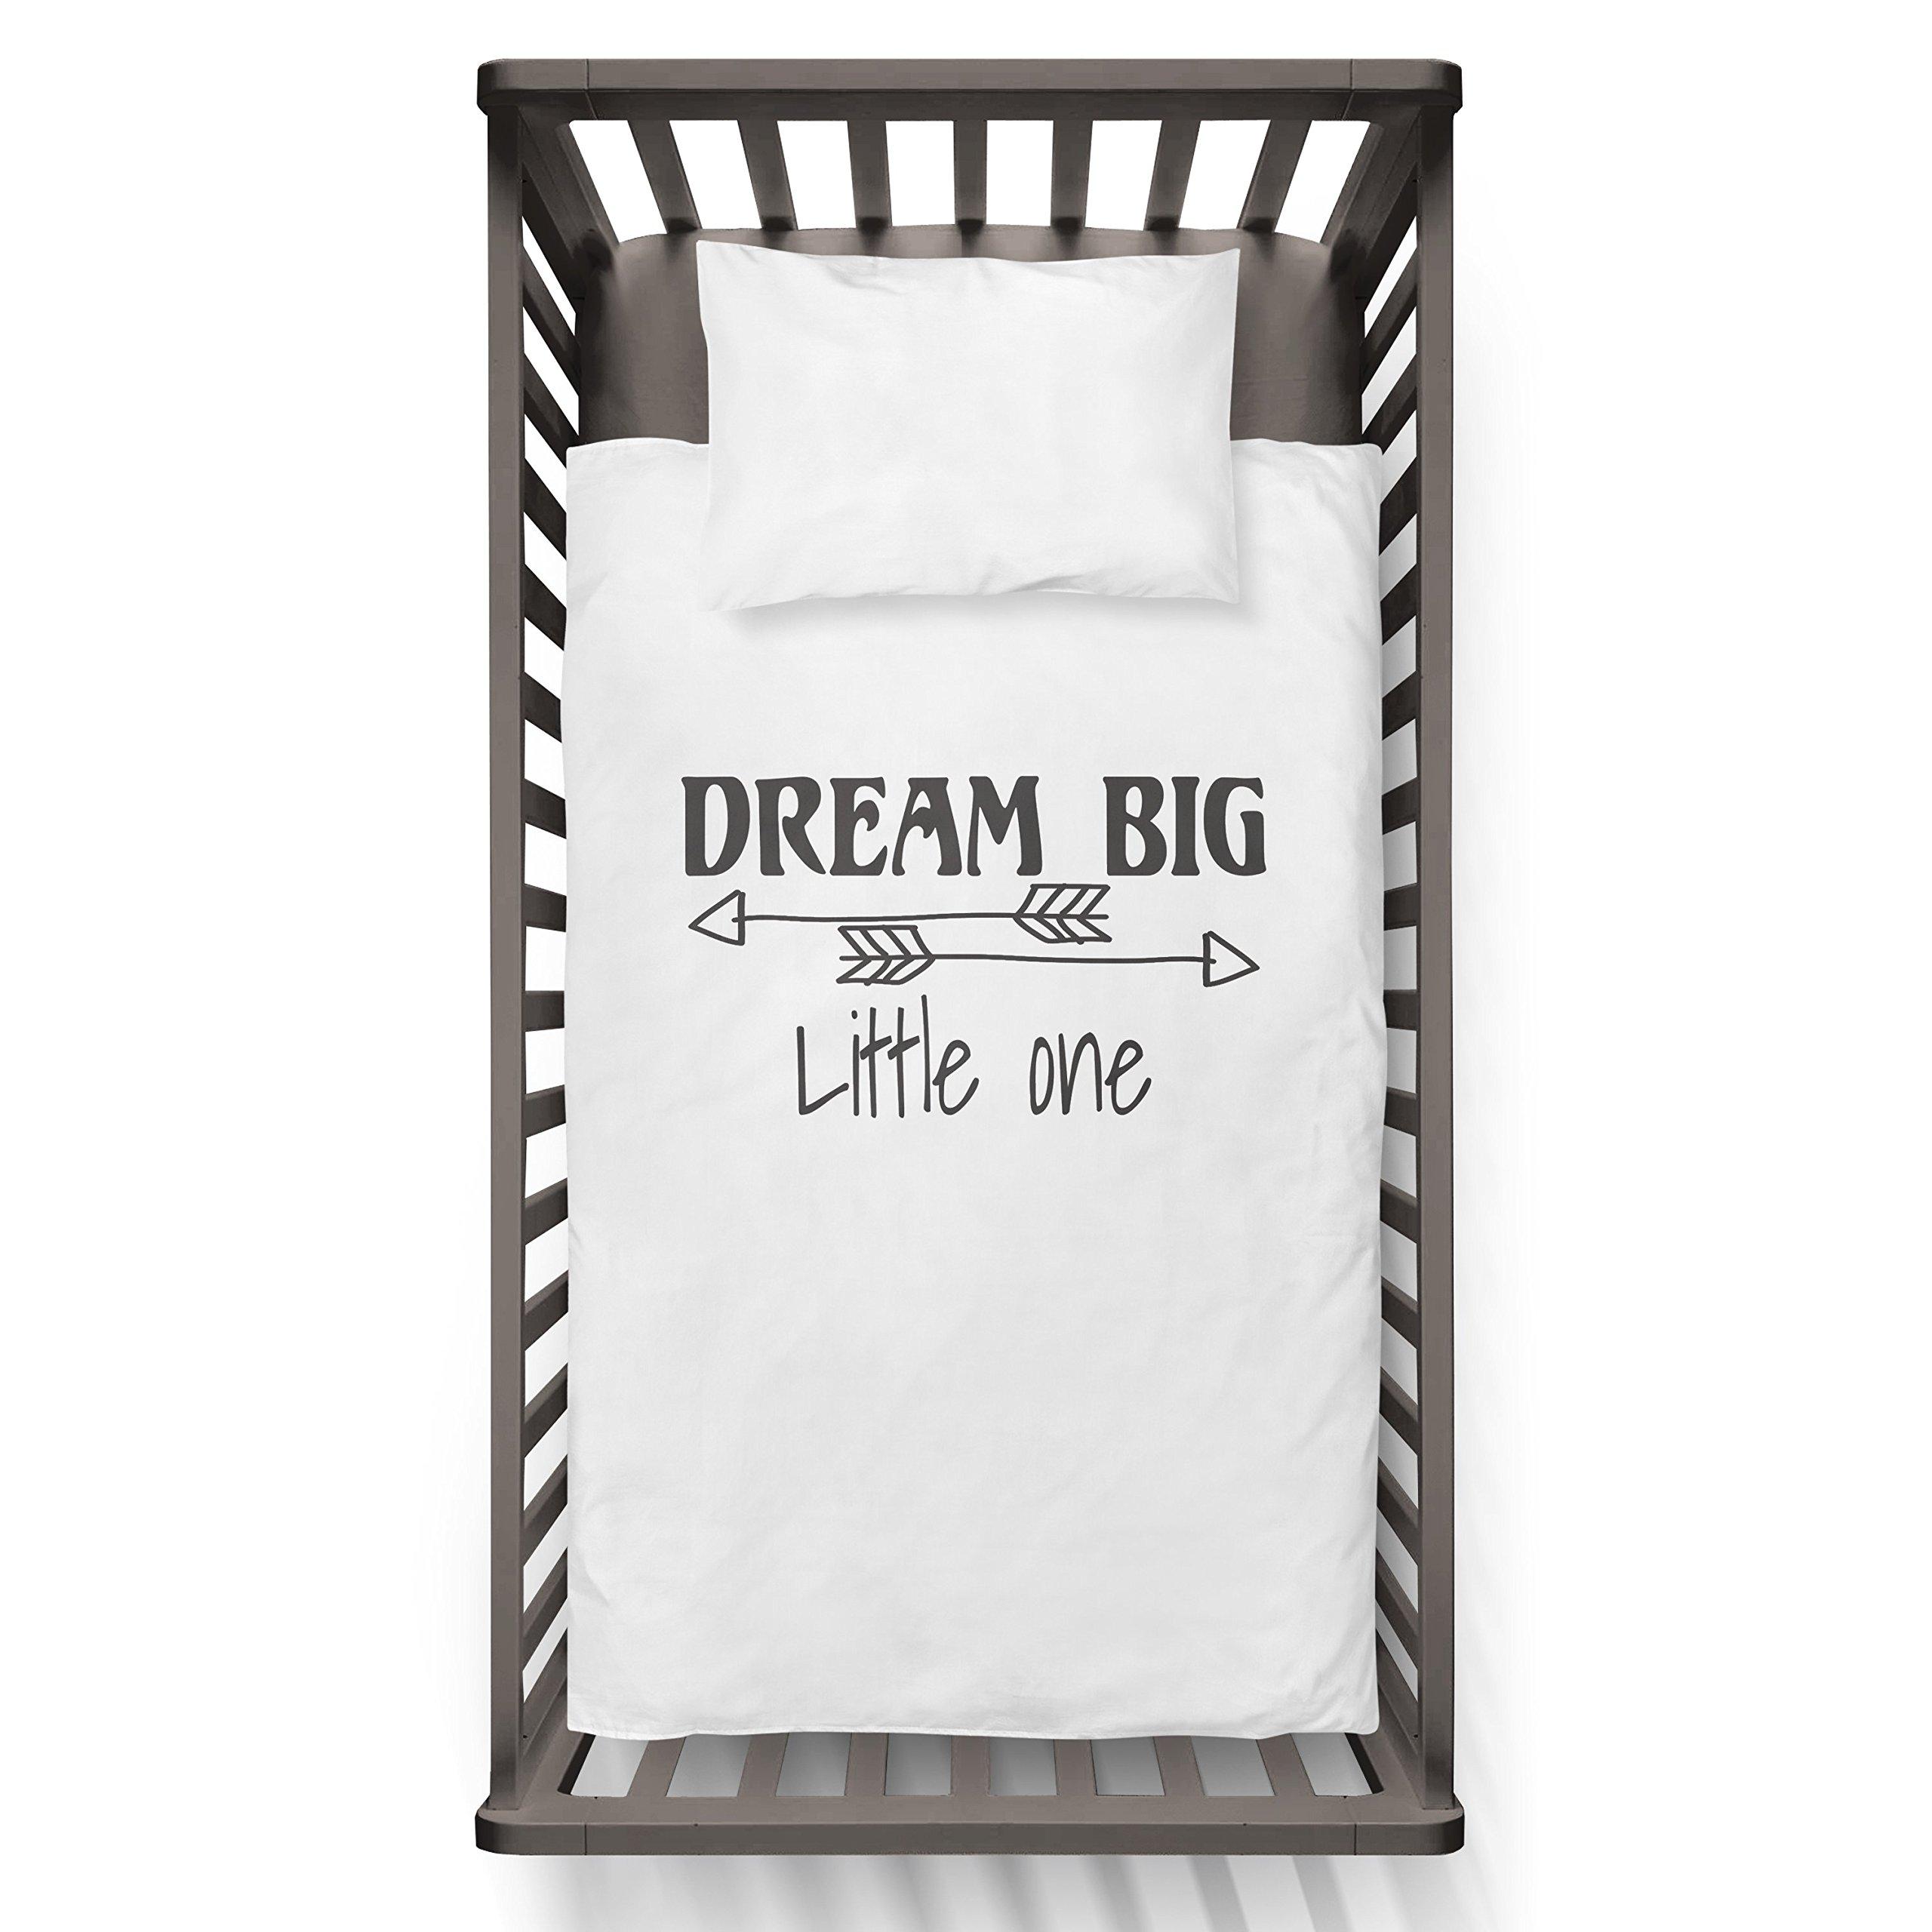 Dream Big Arrow Little One Funny Humor Hip Baby Duvet /Pillow set,Toddler Duvet,Oeko-Tex,Personalized duvet and pillow,Oraganic,gift